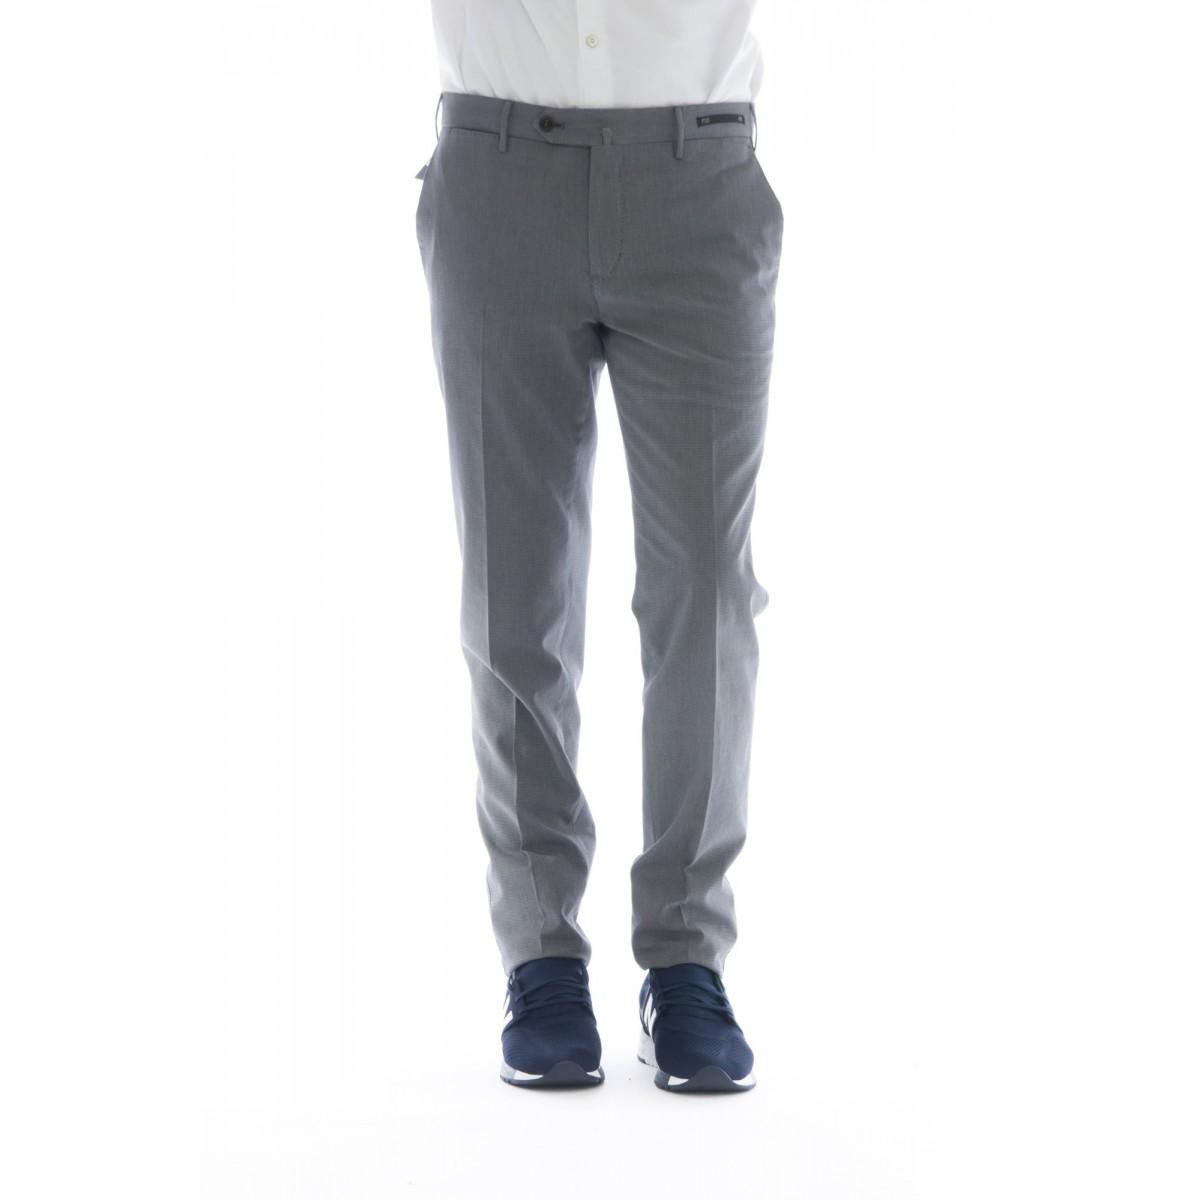 Pantalone uomo - Ccpdl01z00clp super slim microlavorato strech